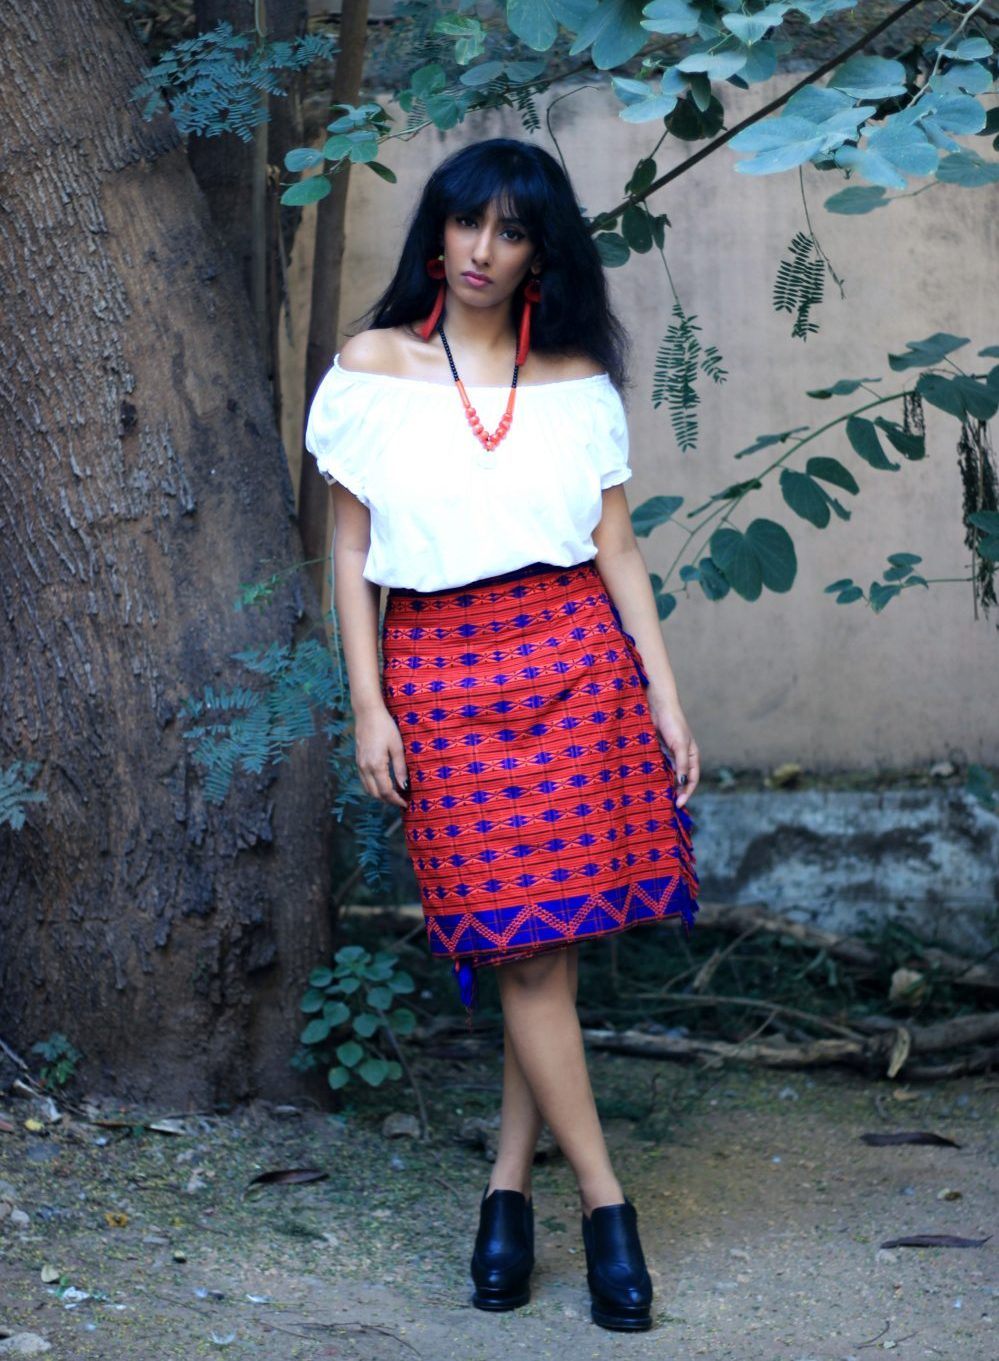 hyderabad fashion bloggers ; ilandlo ; nagaland ; naga style ; nagaland fashion ; northeast fashion ; northeast ; ao tribe ; naga tribe ; tribal wear ; tribal fashion ; streetstyle ; indian streetstyle ; streetfashion ; lookbook ; outfit ; ootd ; fashion ; style ; beauty ; hyderabad fashion blogger ; hyderabad blogger ; dark ; vintage ; prints ; fashion story ; Naznin Suhaer ; I Dress for the Applause ;